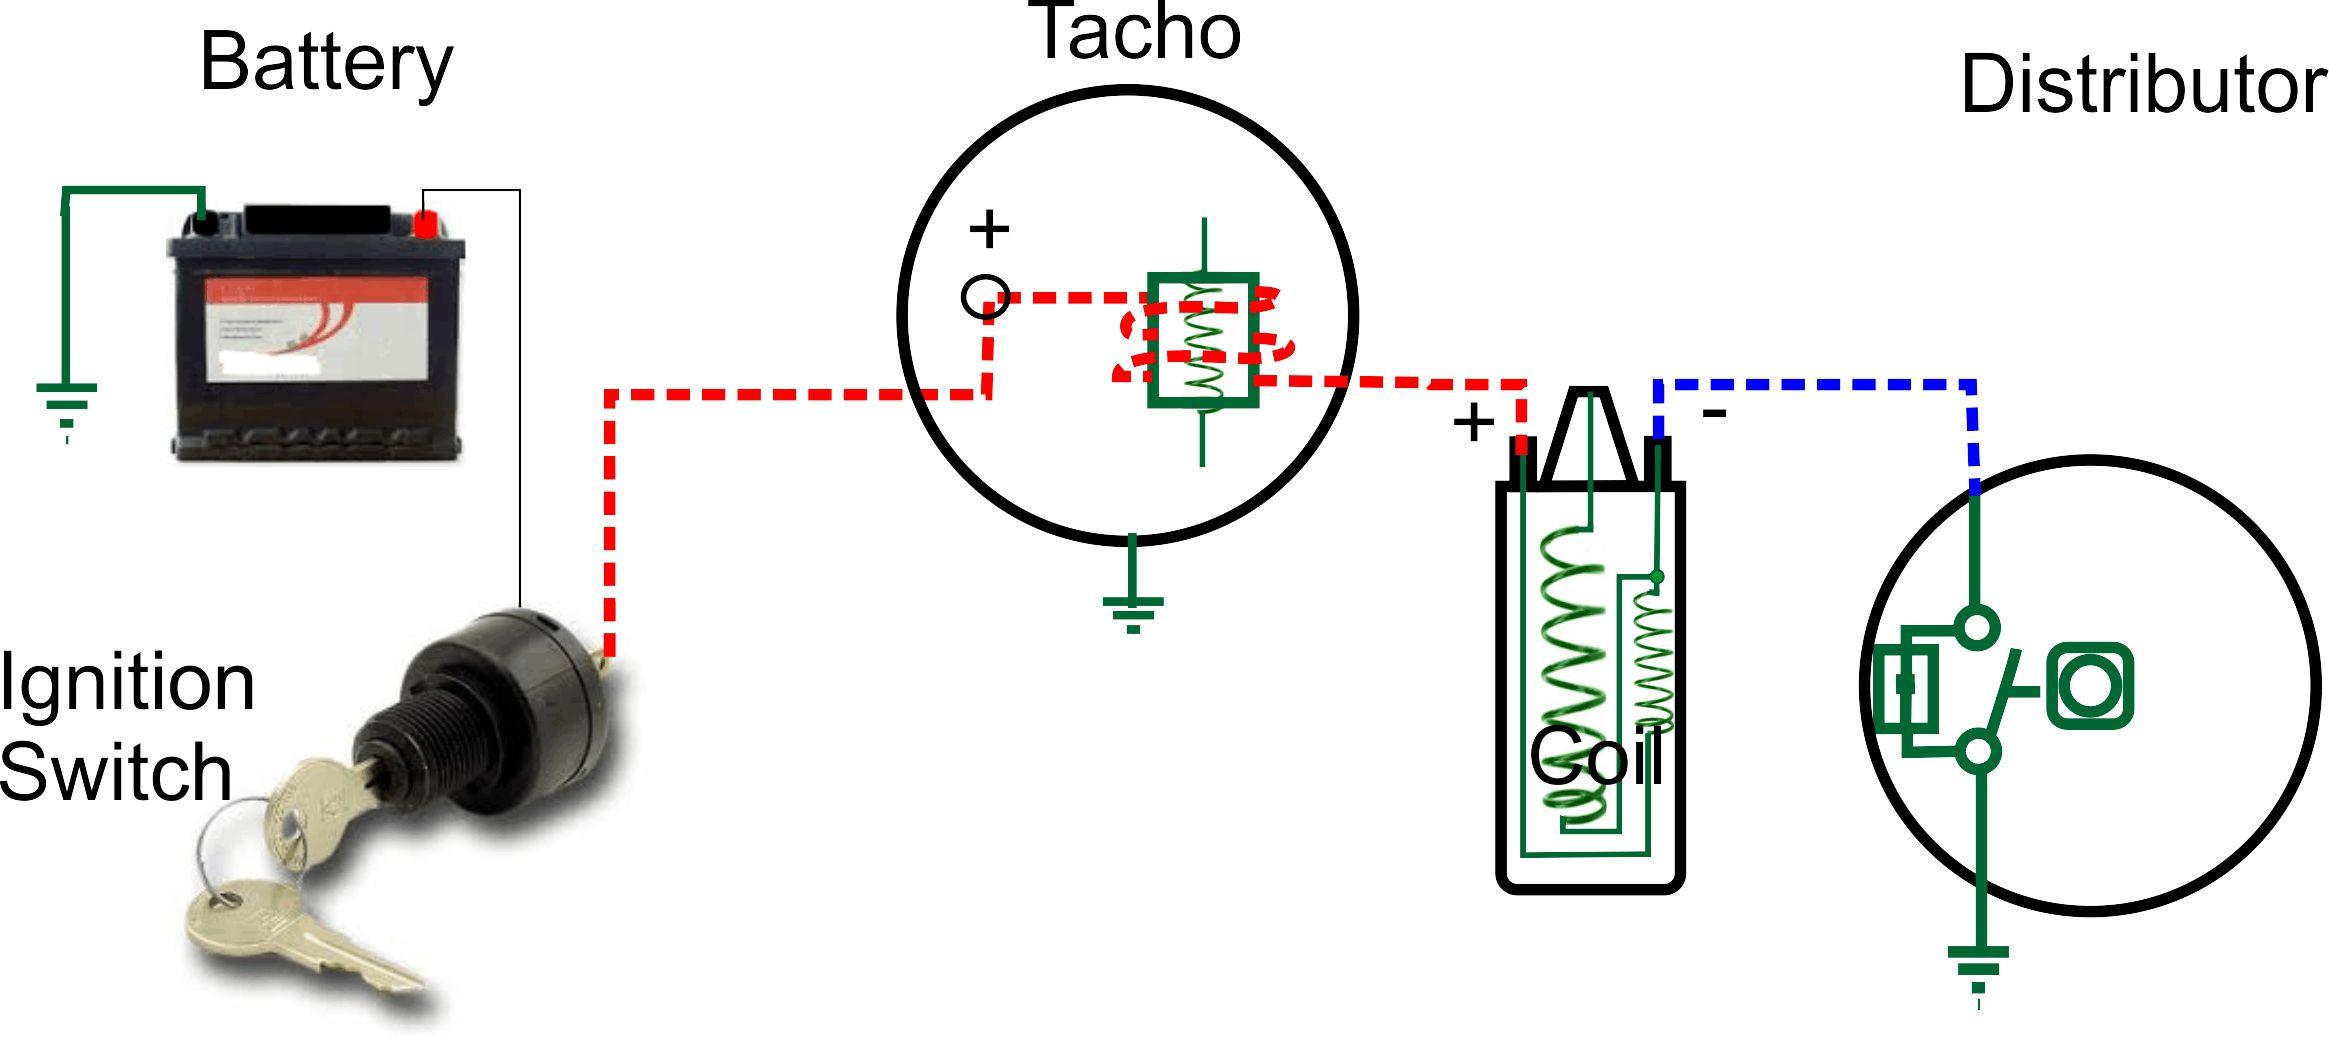 mopar tachometer wiring diagram